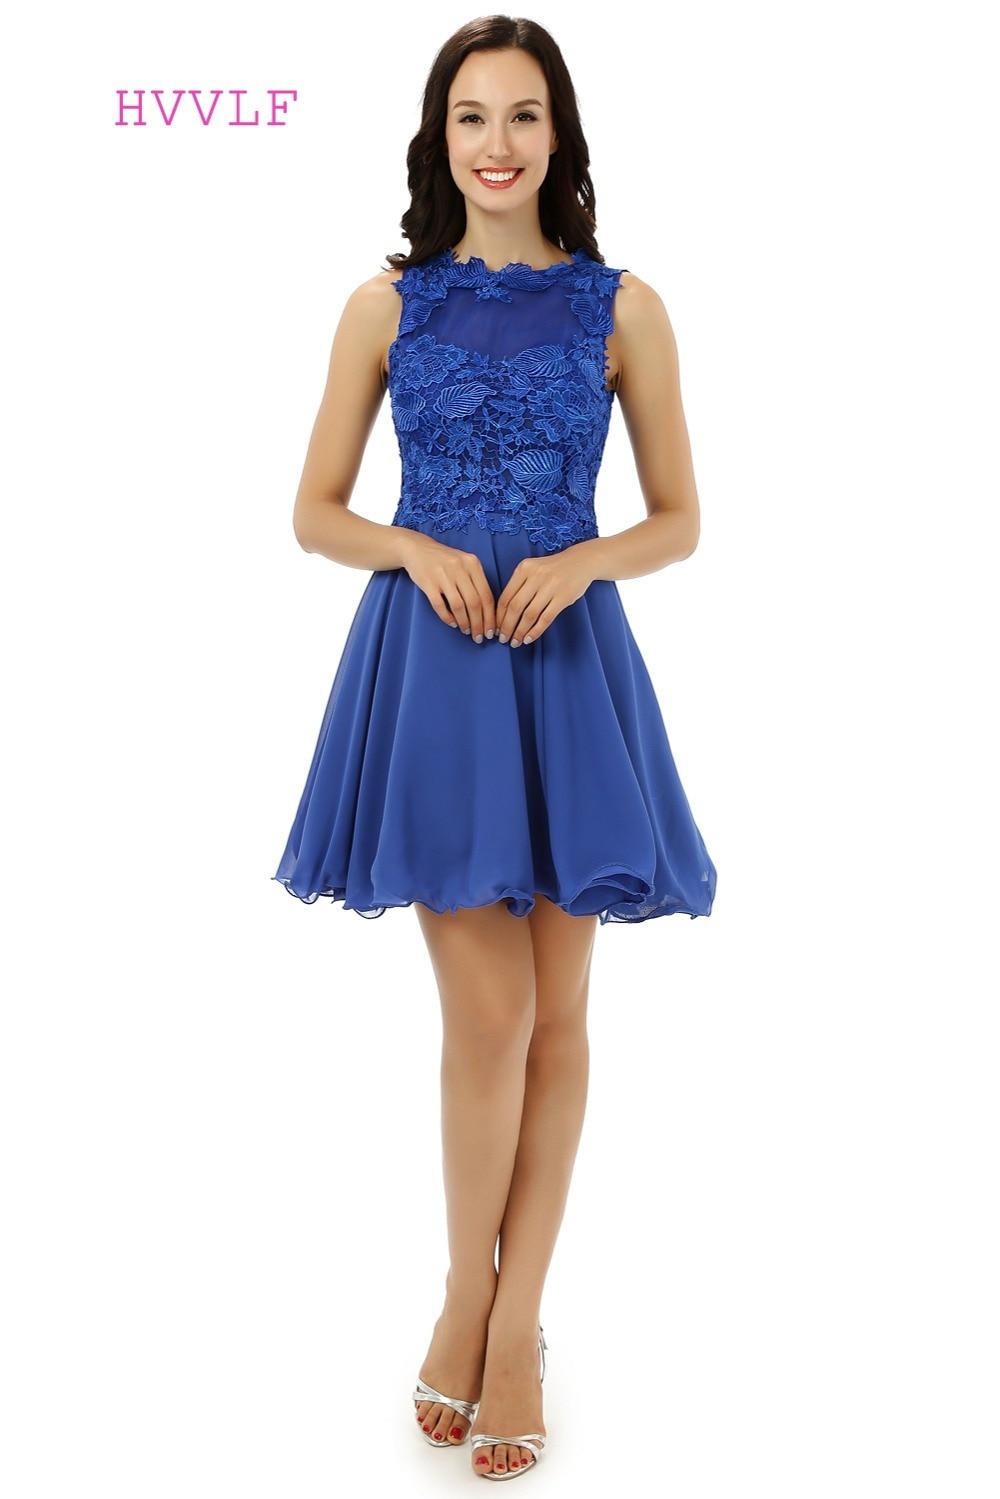 Blau 2019 Homecoming Kleider A-linie Halter Perlen Kristalle Backless Short Mini Elegante Cocktail Kleider Weddings & Events